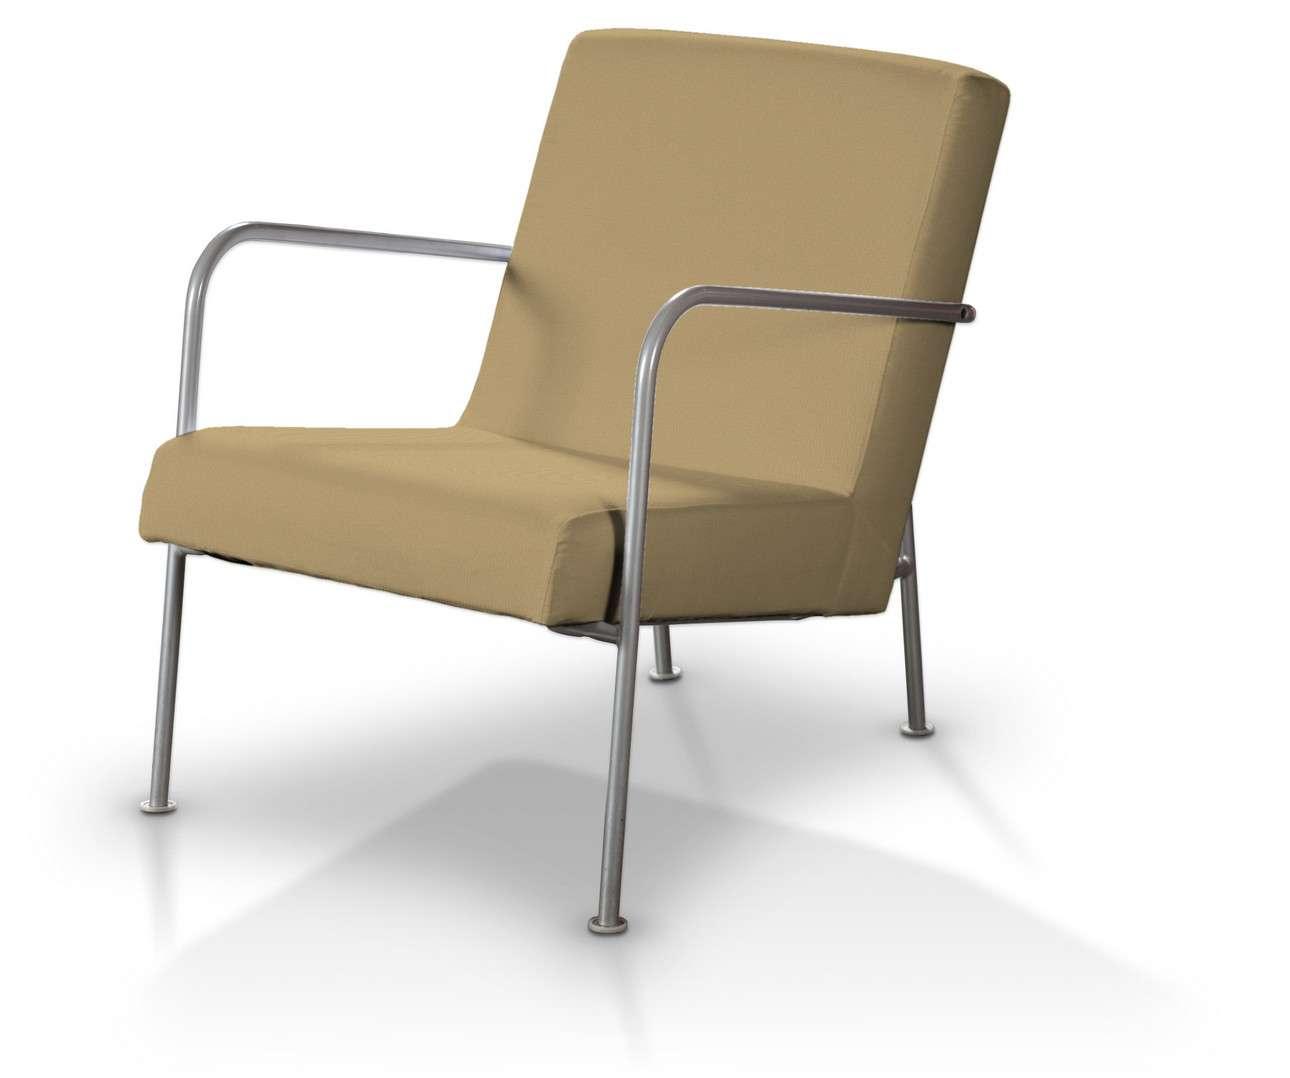 Ikea PS Sesselbezug von der Kollektion Living, Stoff: 160-93